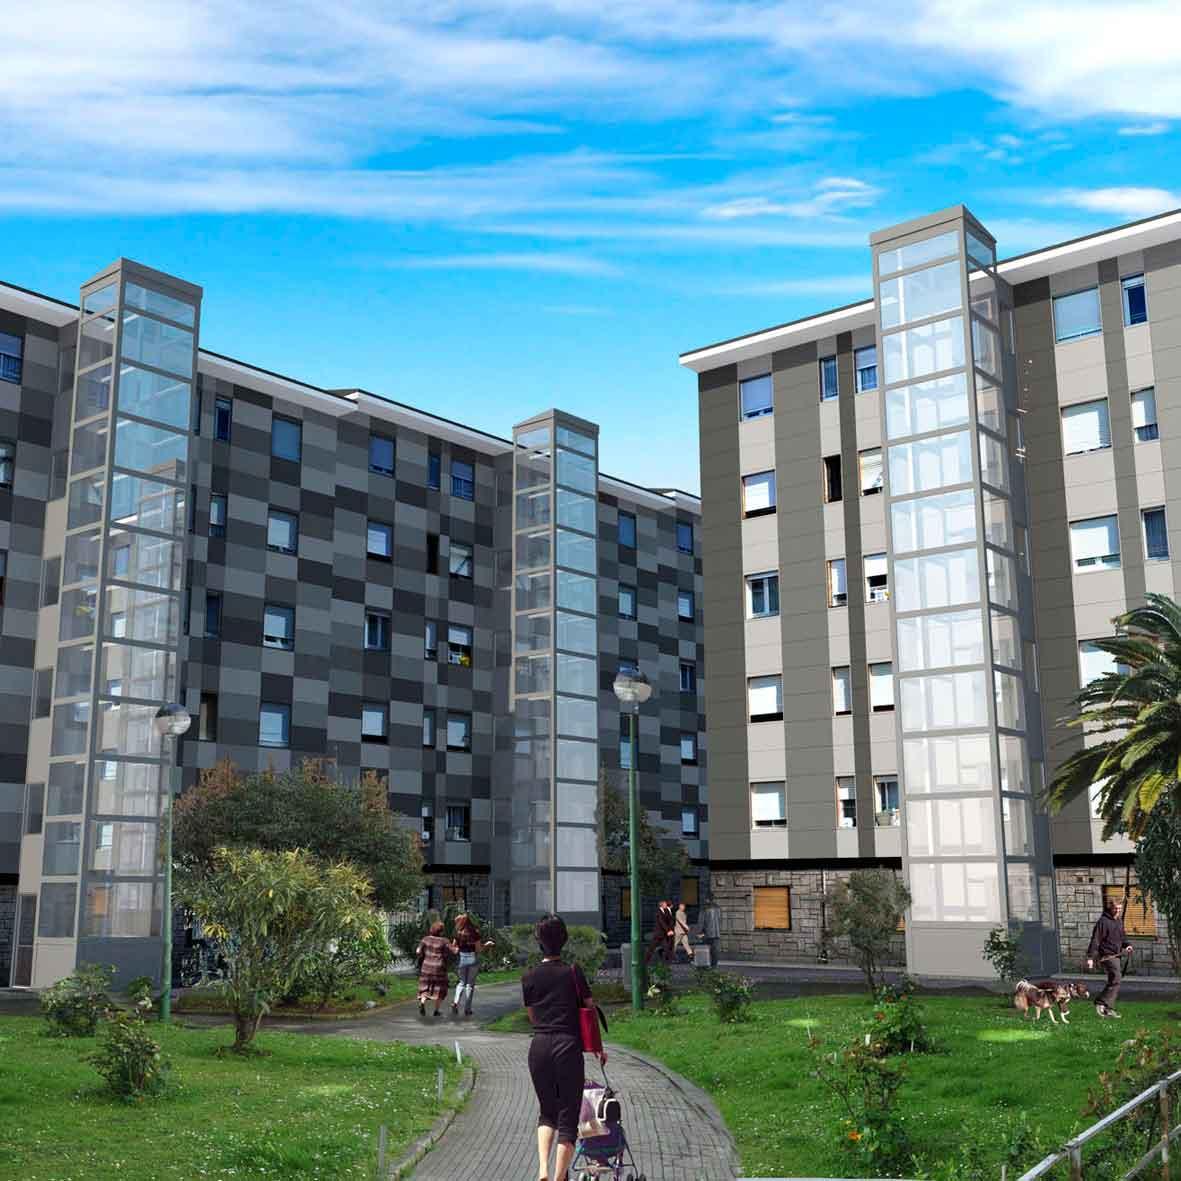 Estudio rehabilitaci n conjuntos residenciales en avil s - Estudio arquitectura asturias ...